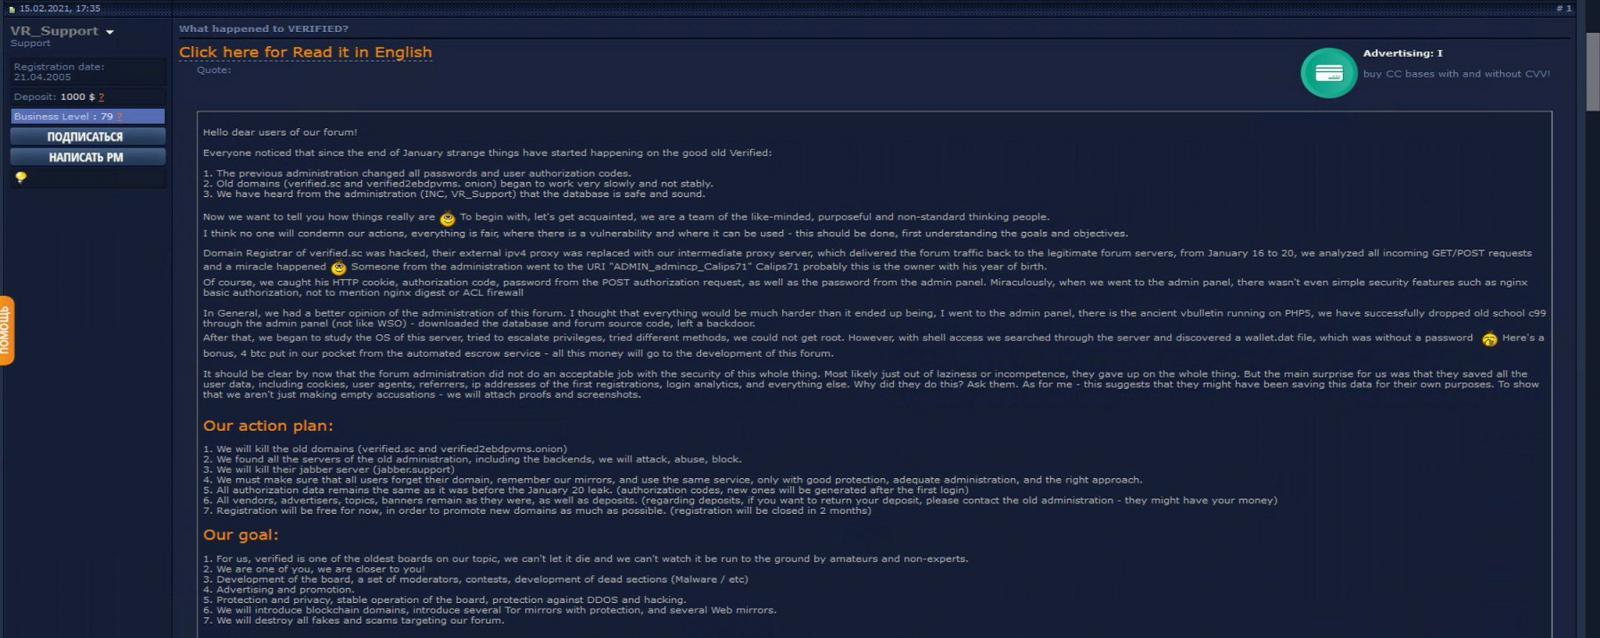 Post explaining takeover of Verified forum